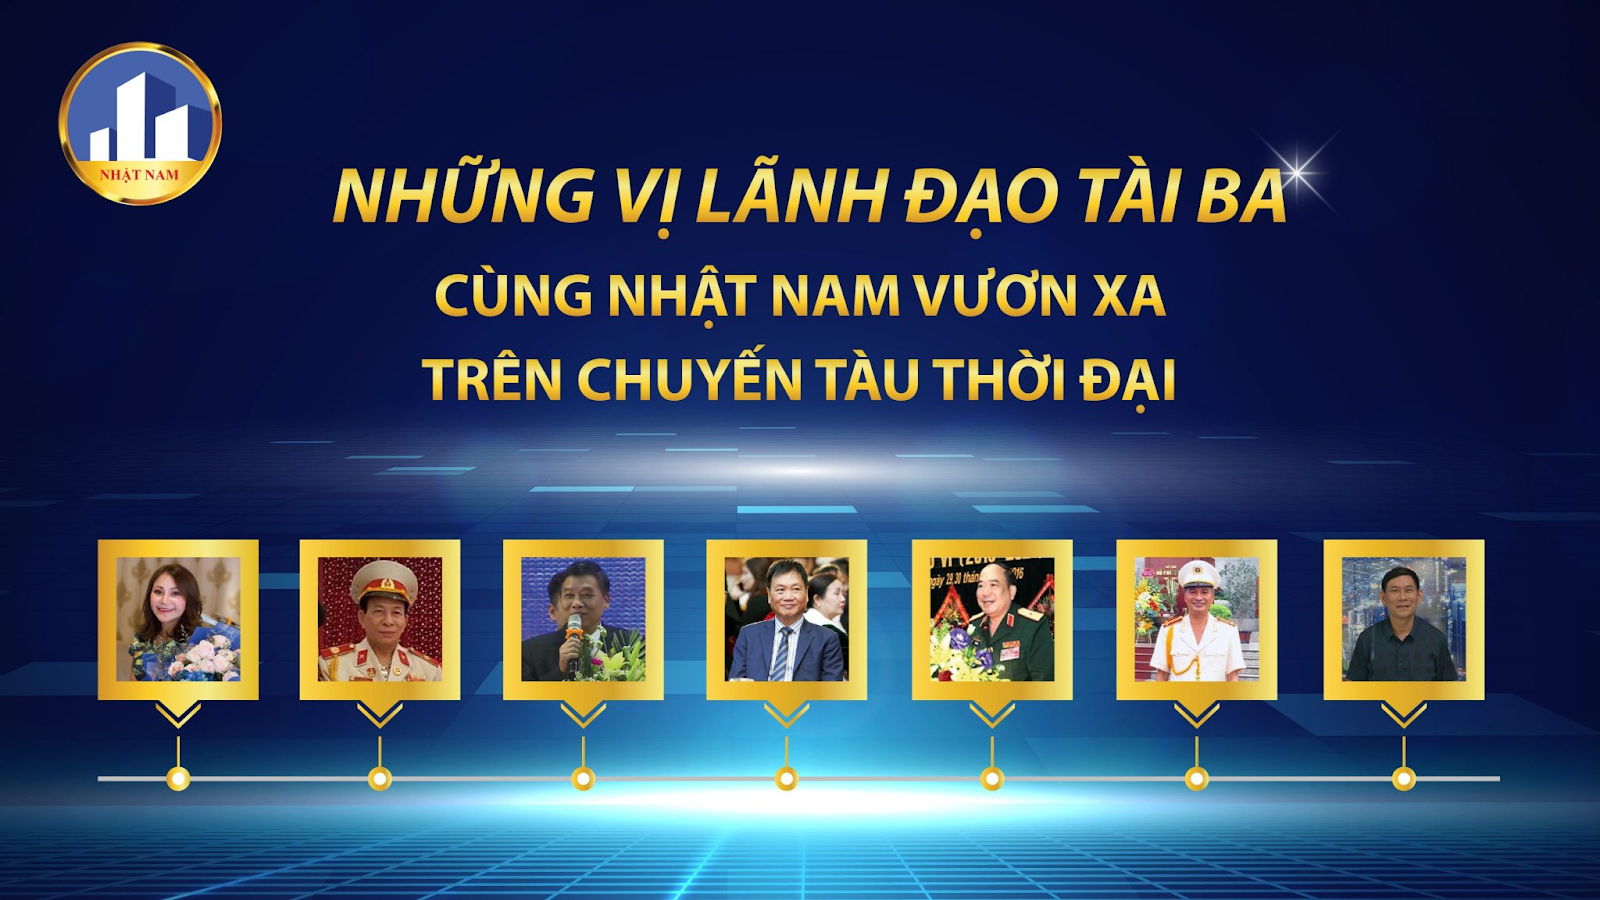 con-nguoi-nhat-nam-yeu-to-cho-su-thinh-vuong-va-ben-vung